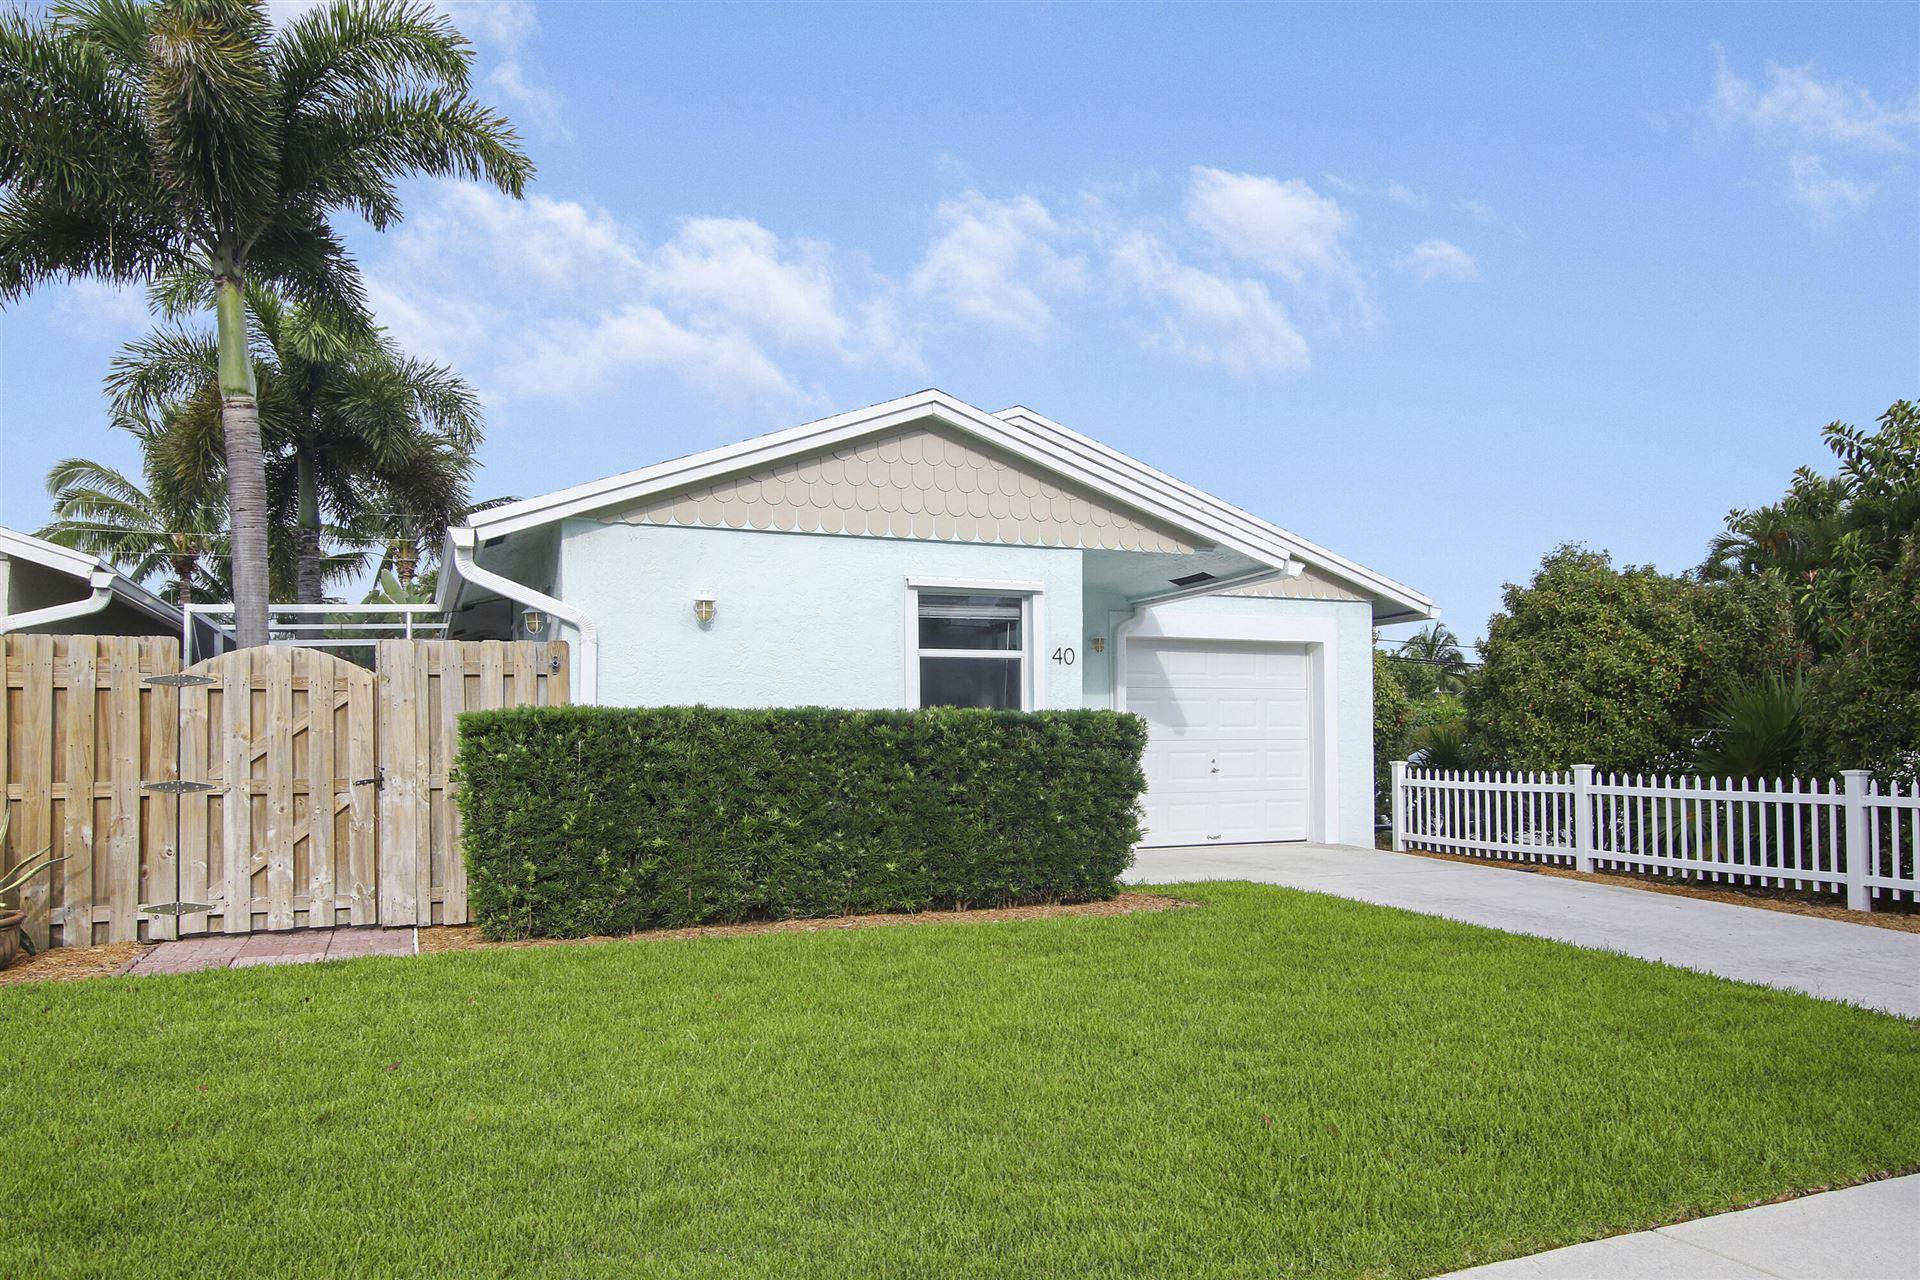 141 E Riverside 40 Drive, Jupiter, FL 33469 - #: RX-10747323